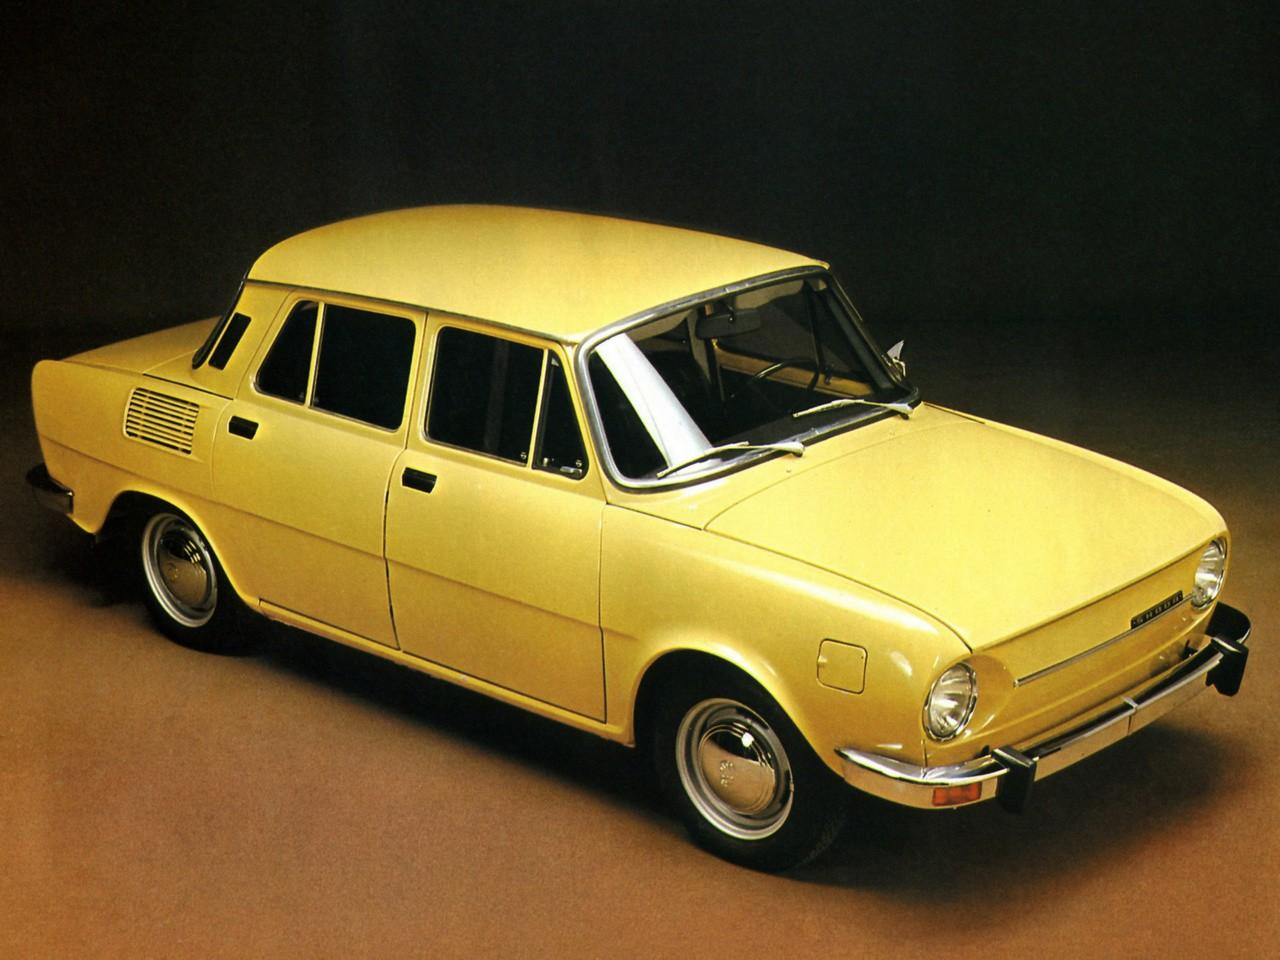 Skoda 100 110 Specs 1969 1970 1971 1972 1973 1974 1975 1976 1977 Autoevolution